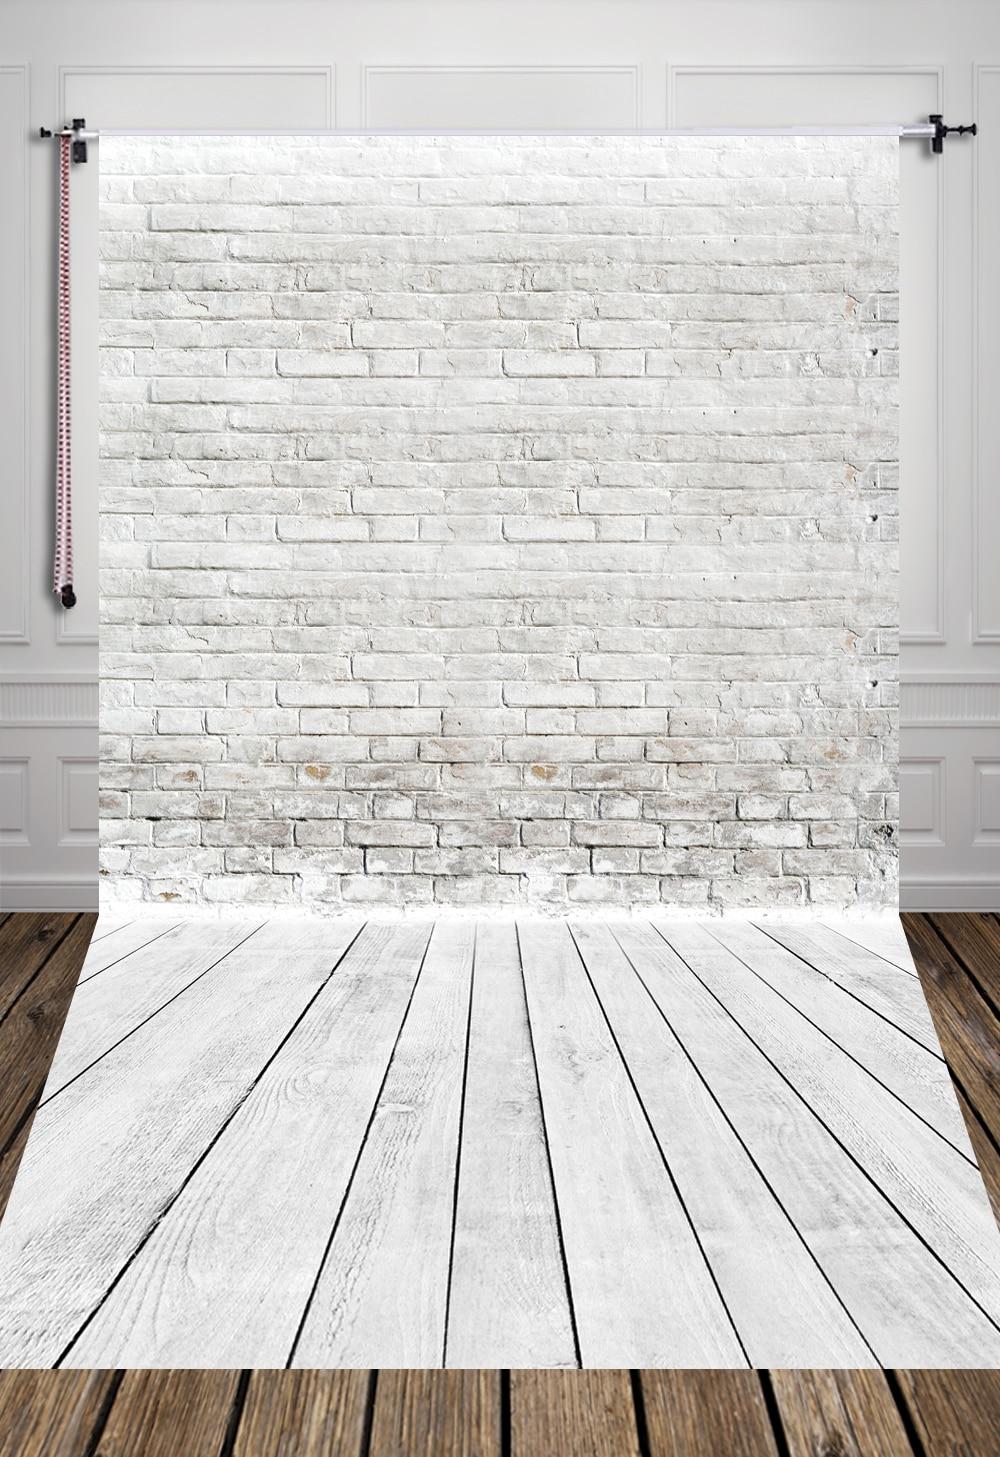 5x7ft (1.5x2.2m) white brick wall photography backdrop Art fabric newborn pet studio photography background D-3880